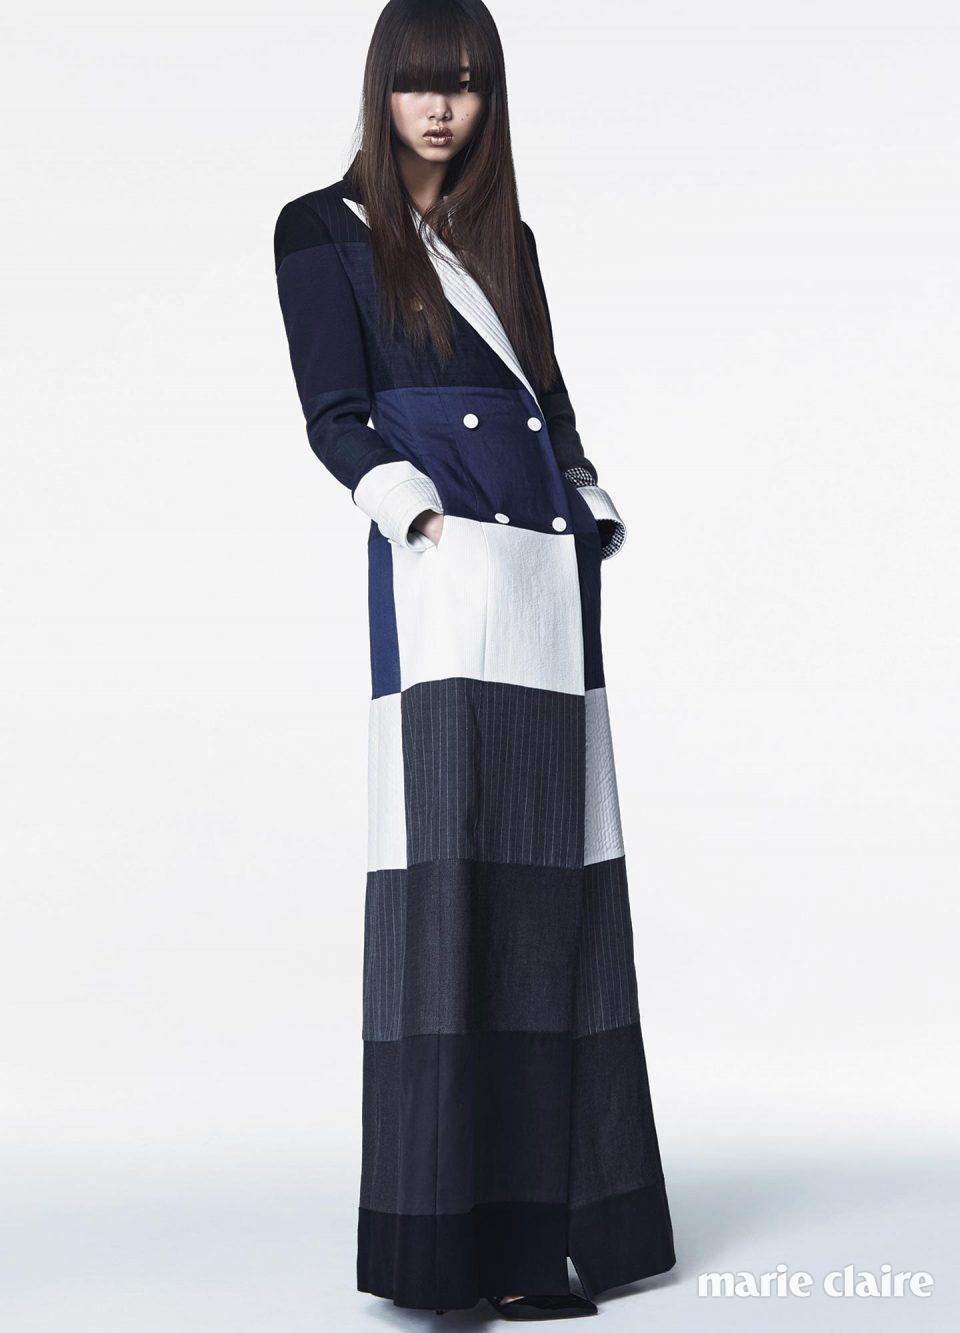 JAYBAEK 자연 섬유와 퀼팅 원단을 패치워크해 테일러드 드레스를 제작했다. Eco-Calling, 친환경 패션 - 마리끌레르 2016년